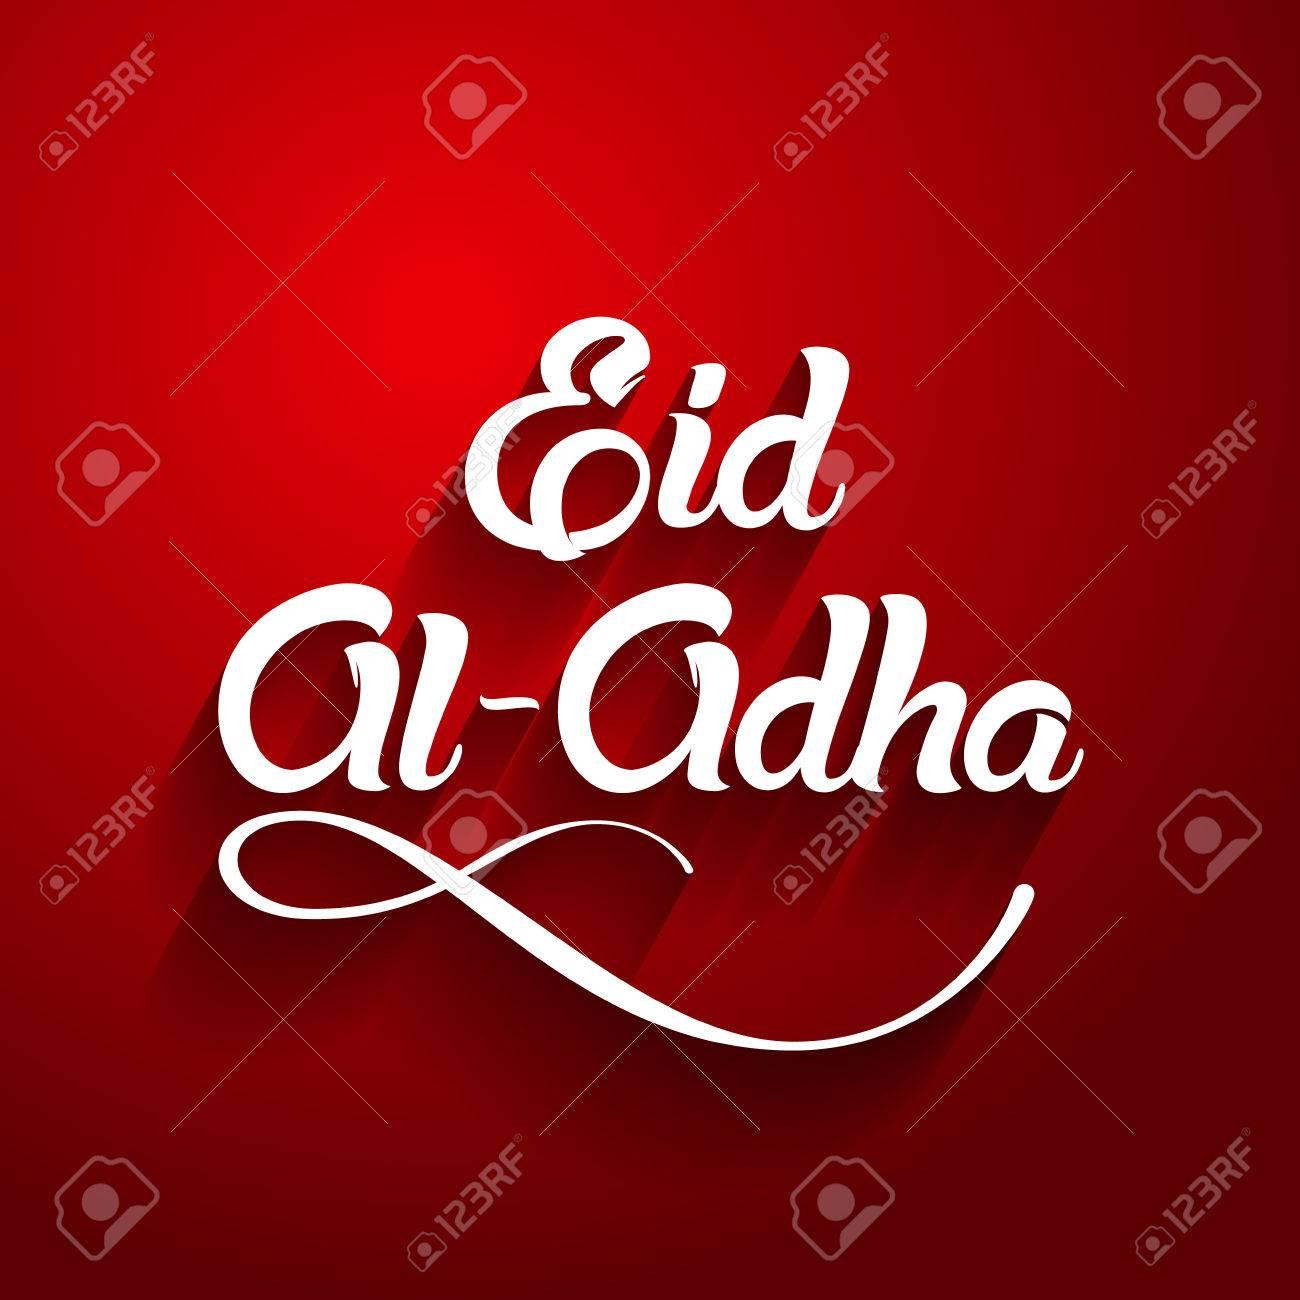 Eid Qurban Eid Mubarak 2018 Wishes Whatsapp Message Facebook